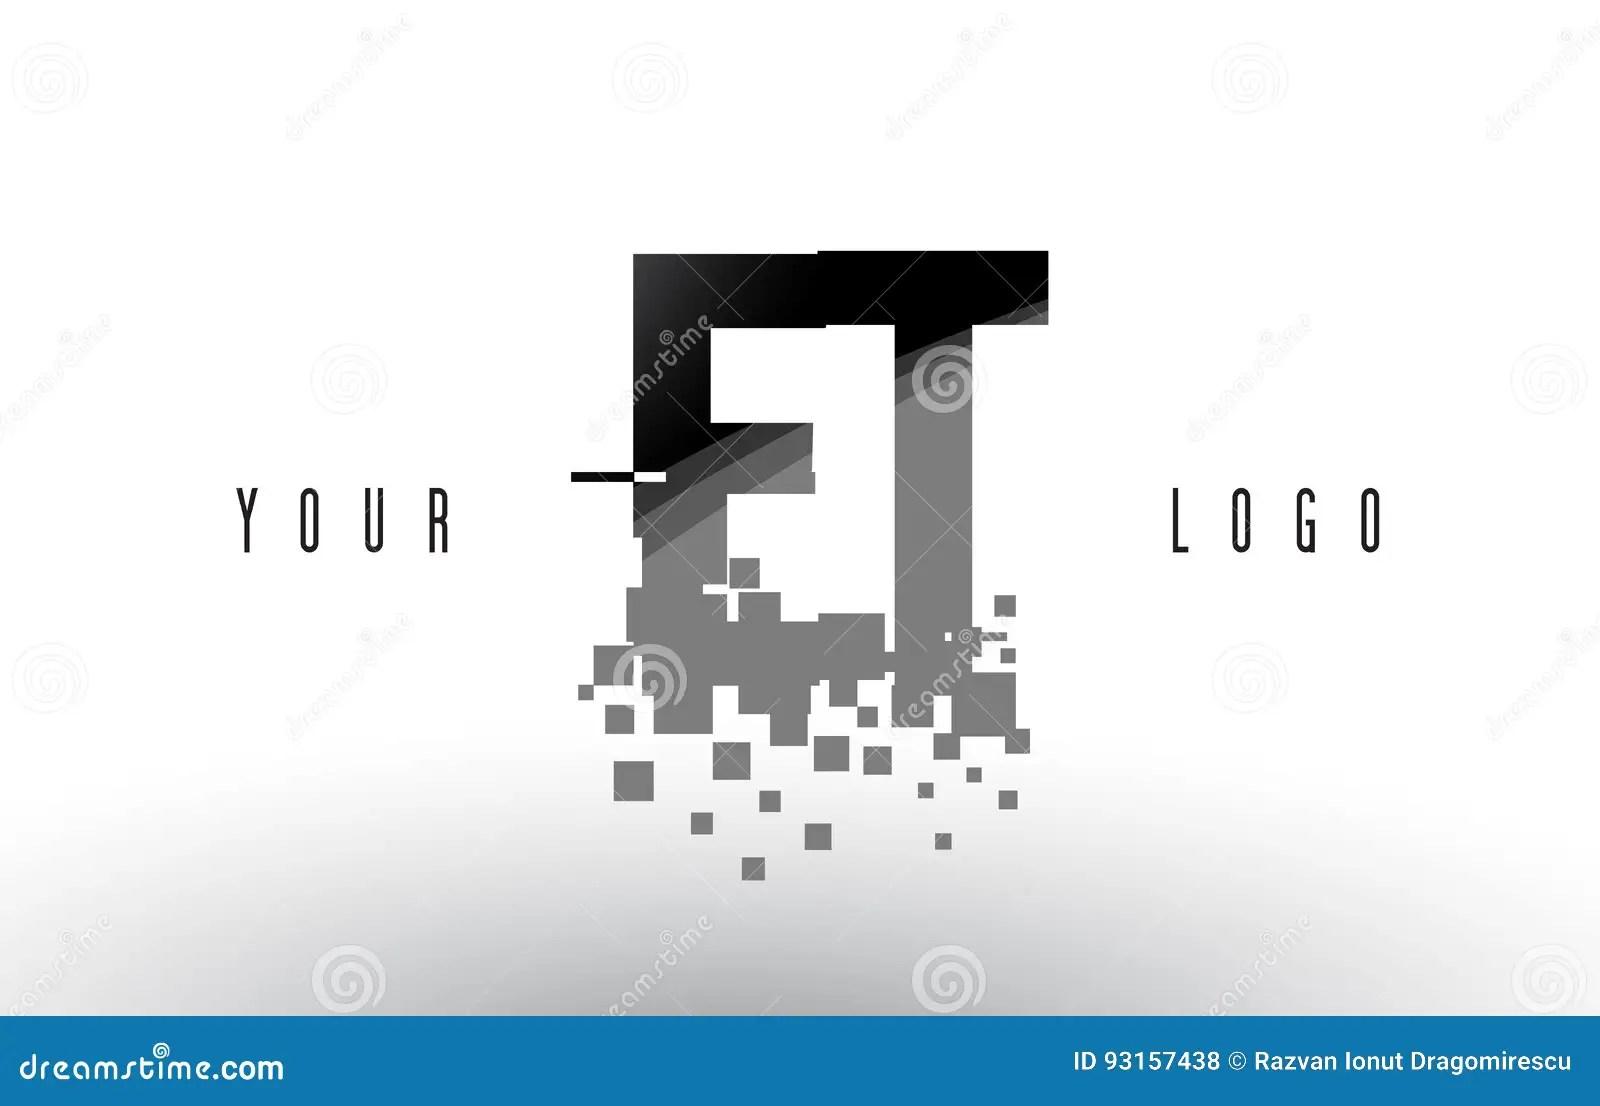 hight resolution of pixel letter diagram data wiring diagram schema parts of a ship diagram et e t pixel letter